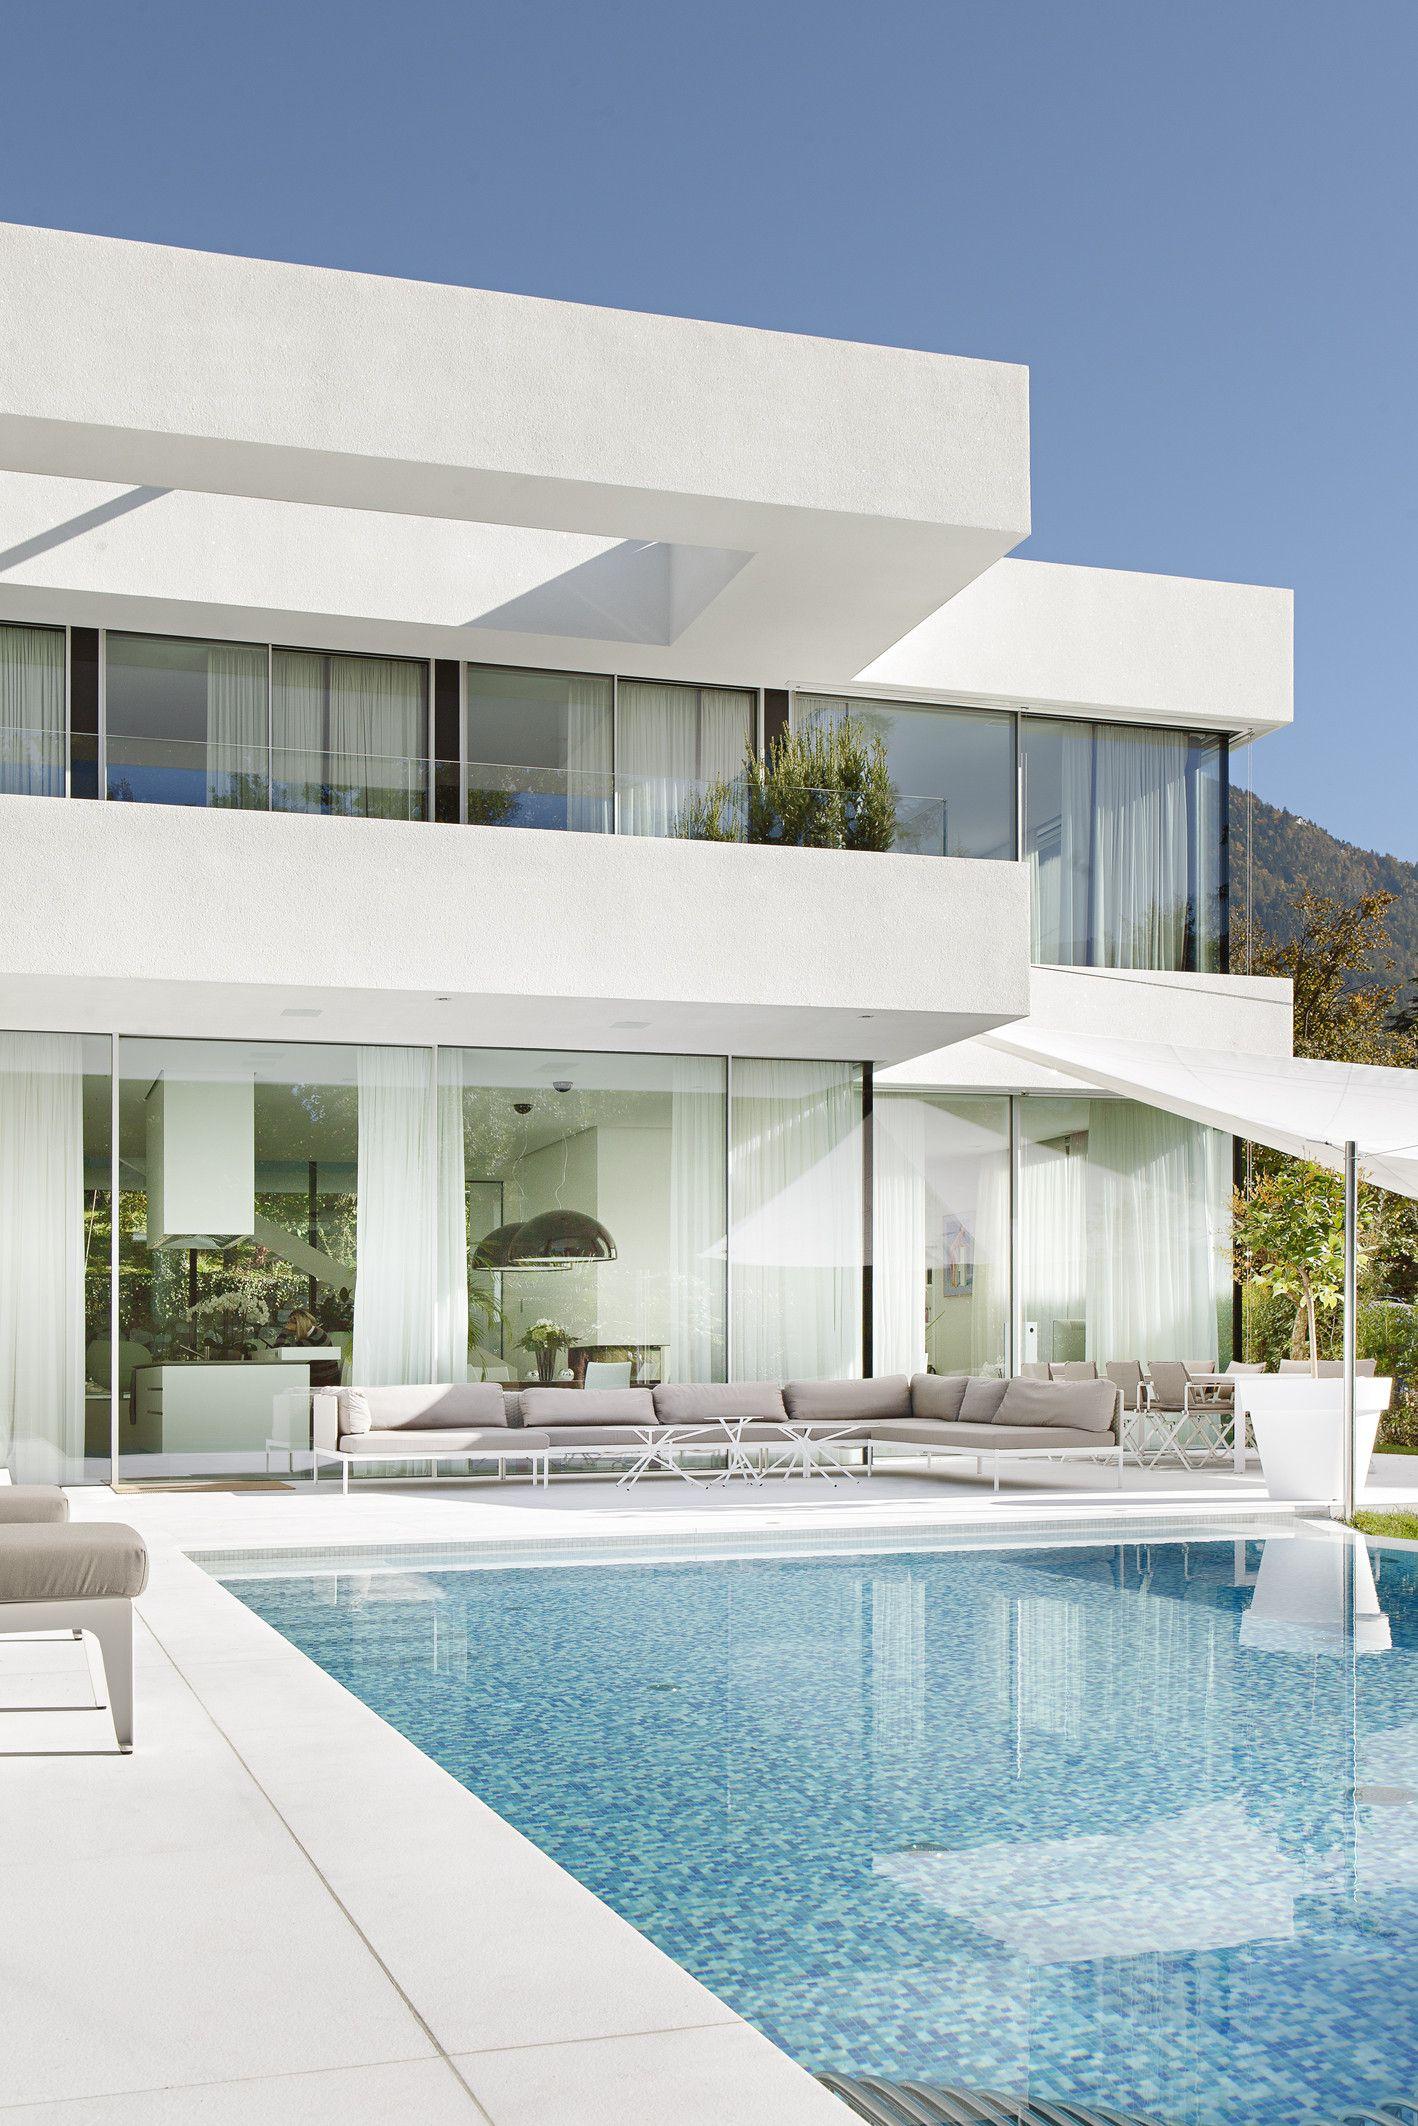 Gallery of House M / monovolume architecture + design - 12 ...